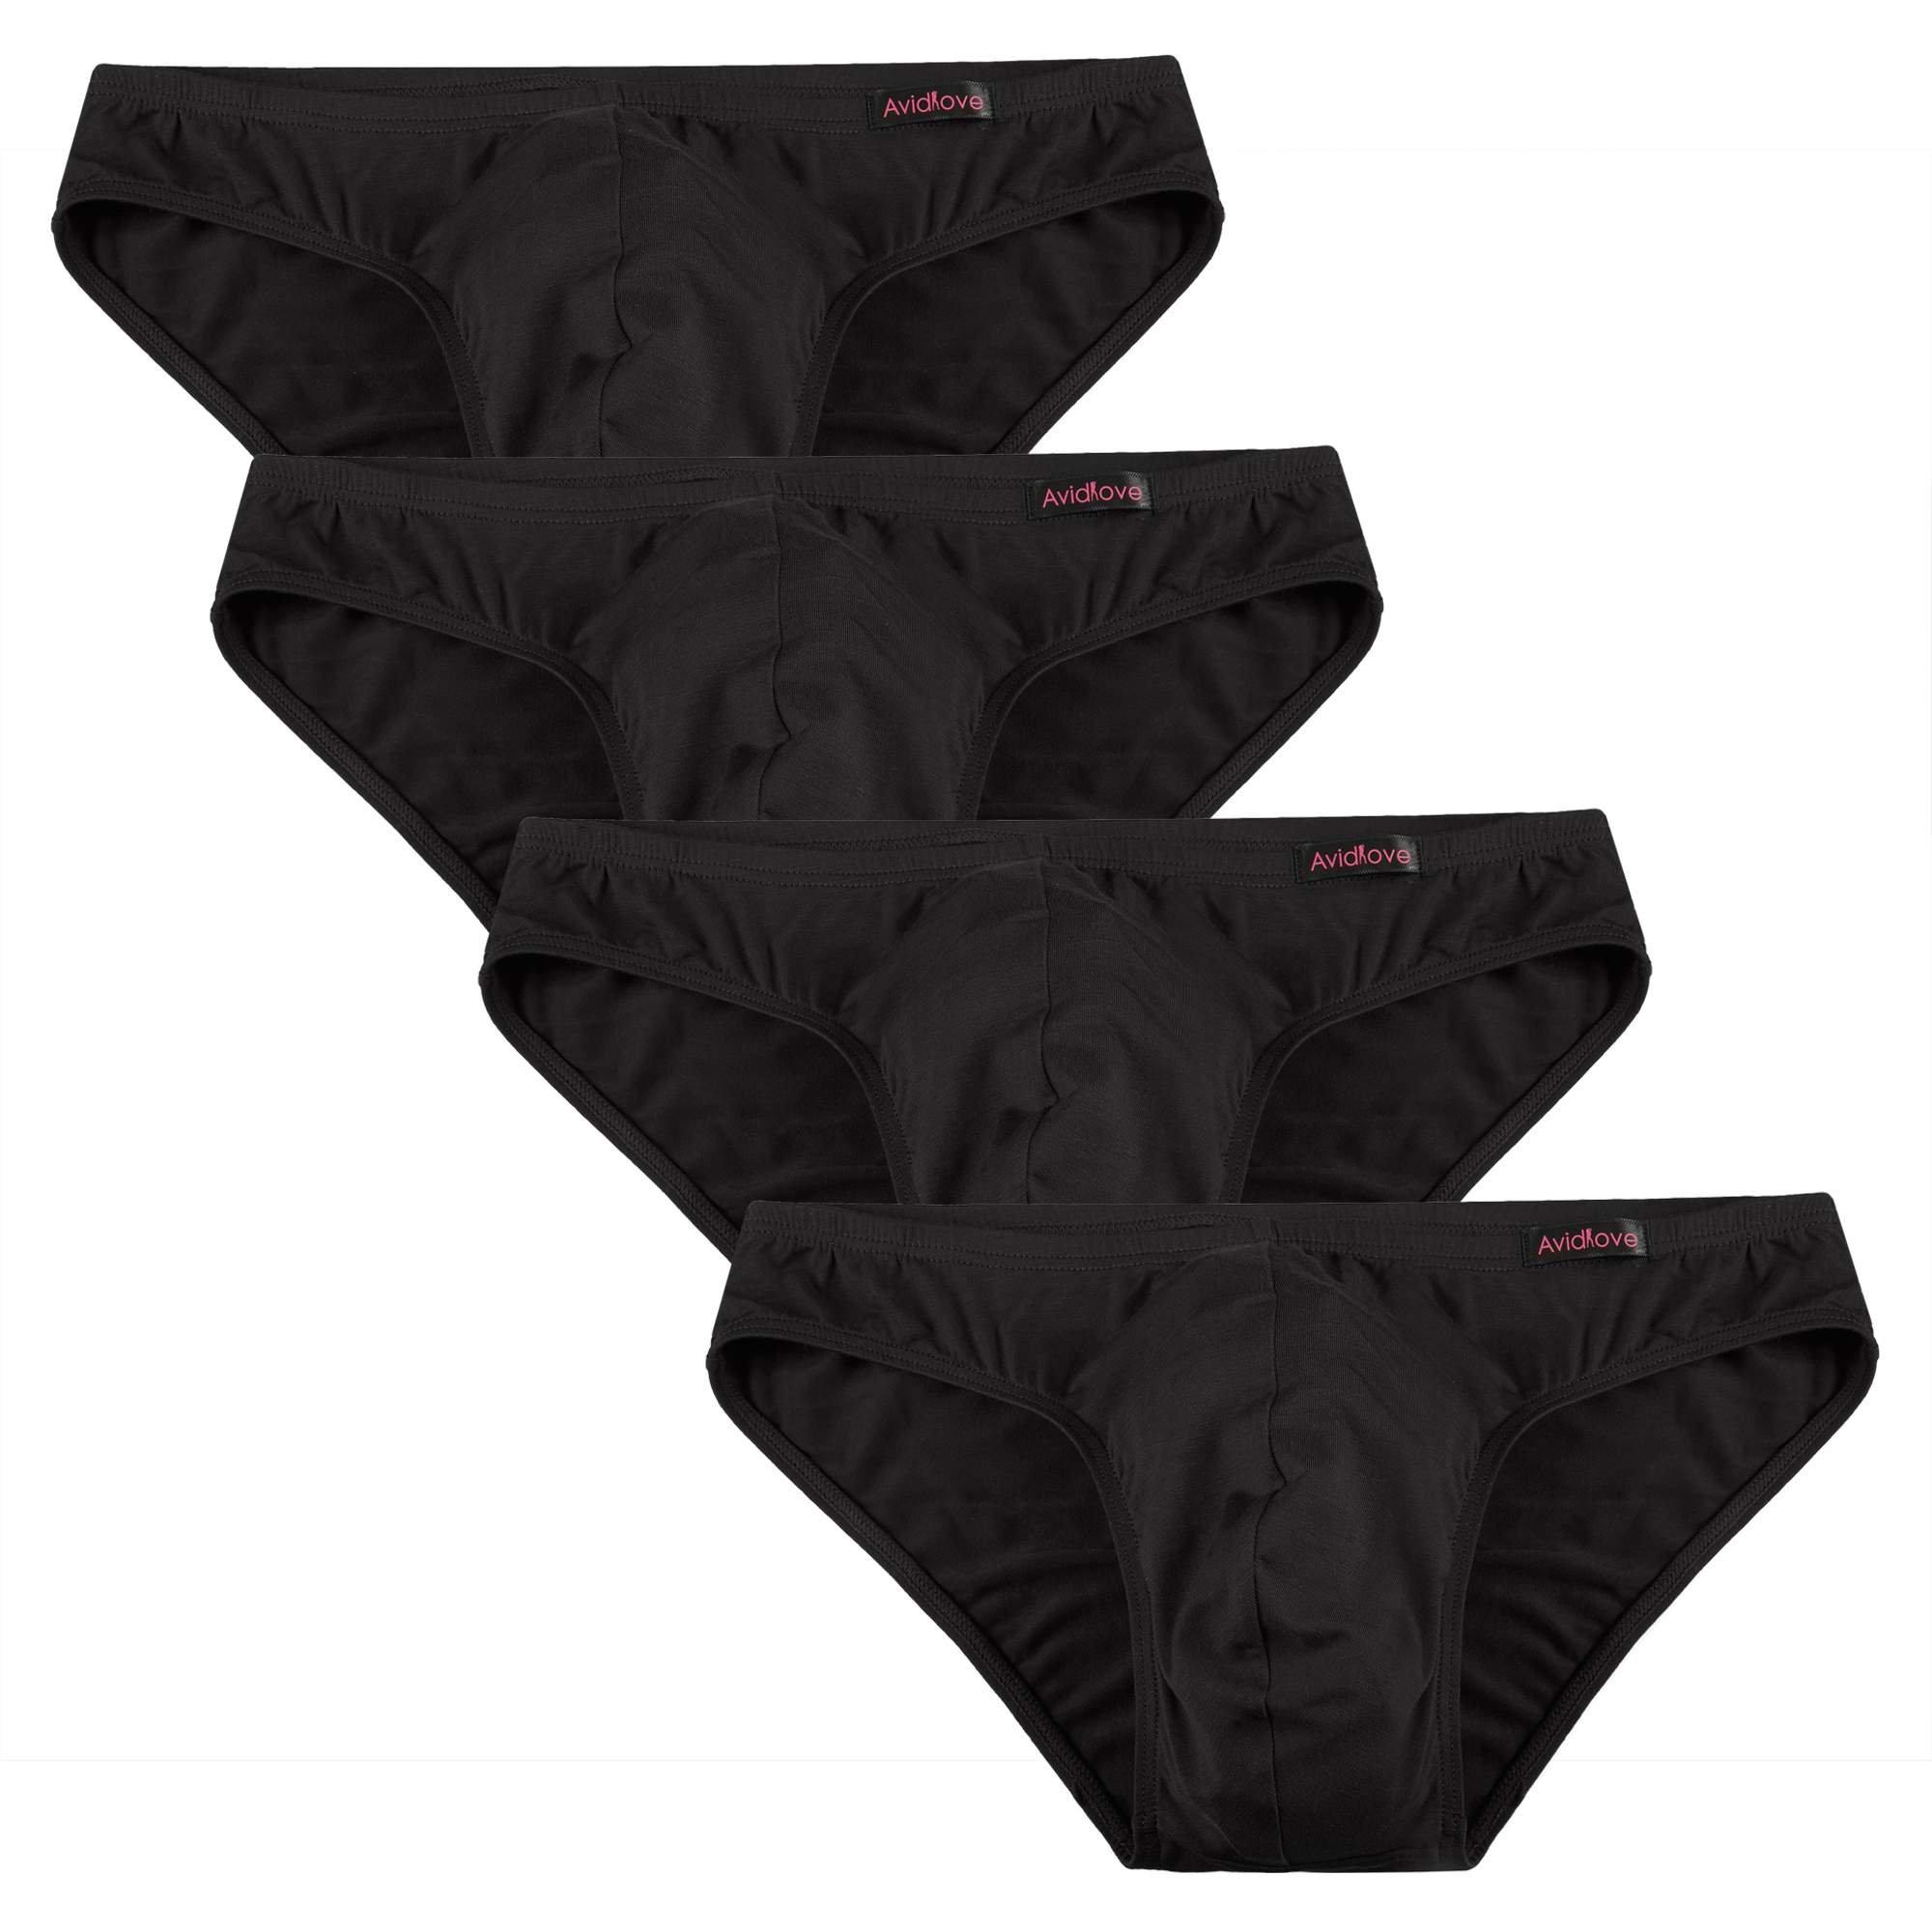 fc8f279b9809 Avidlove Men Underwear Micromodal Bikinis 4 Pack Briefs product image